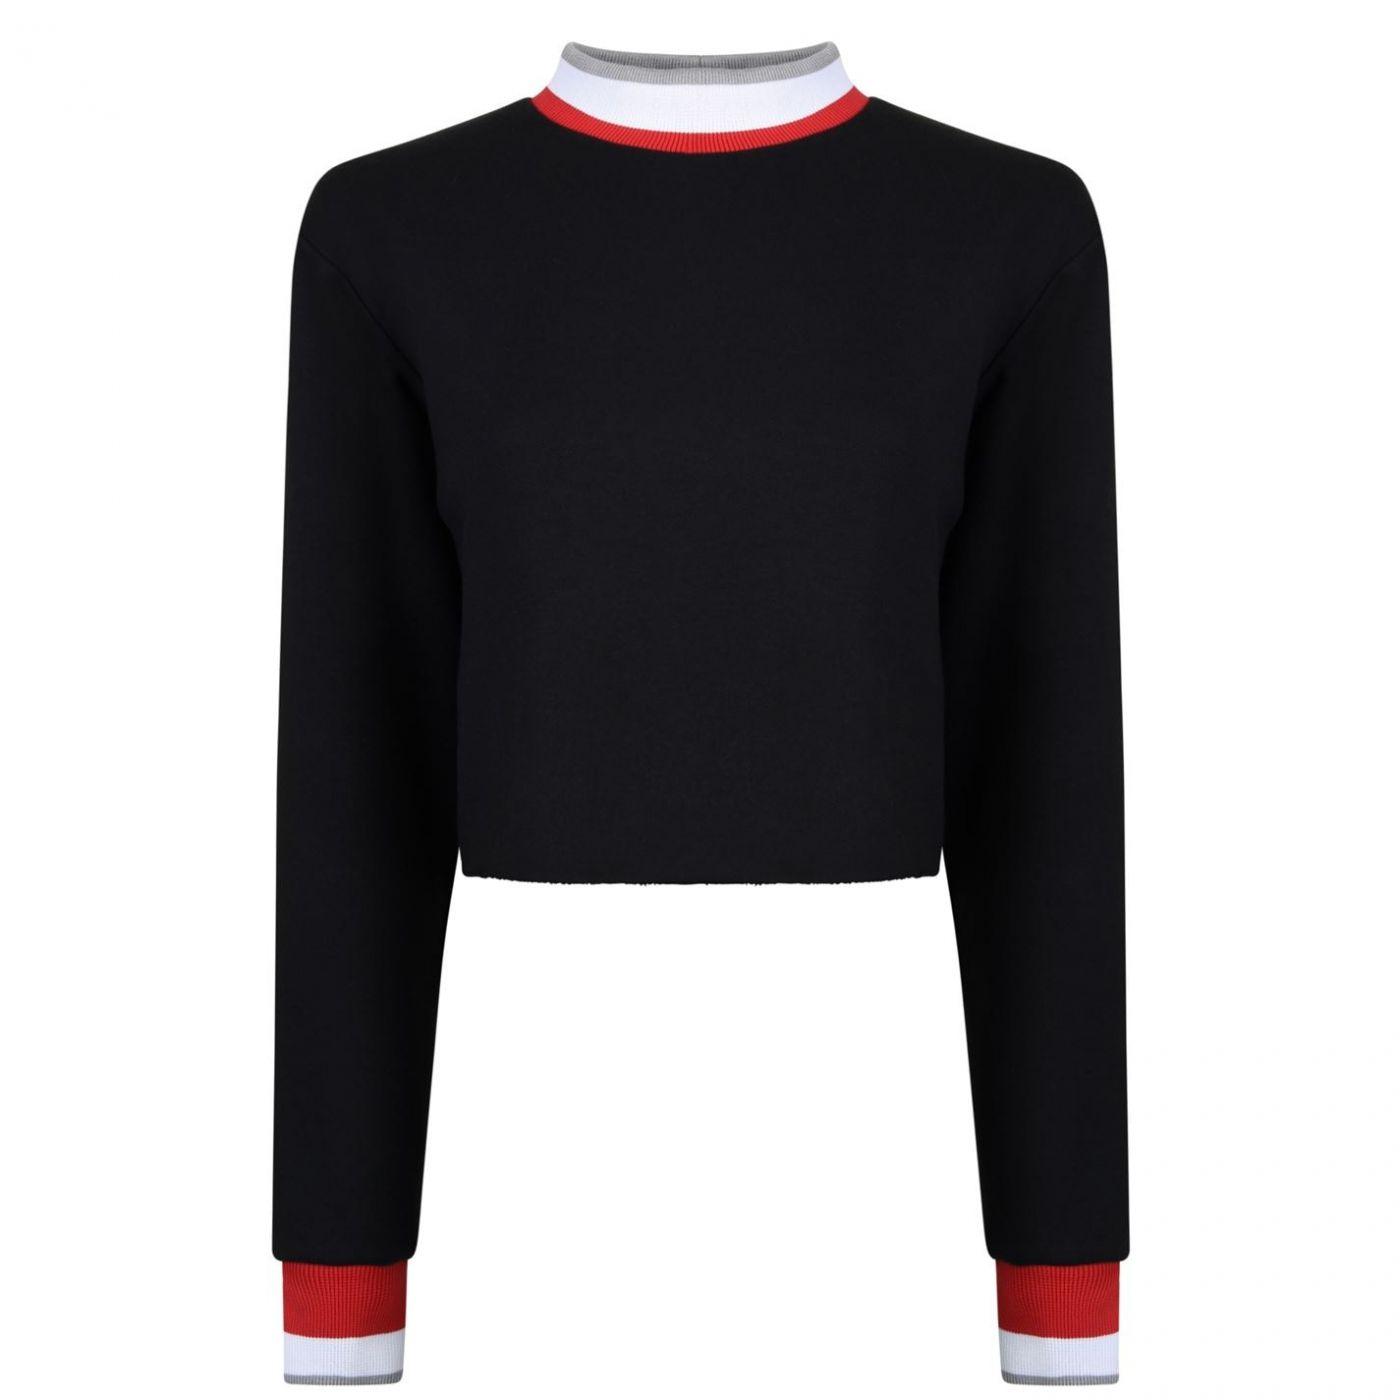 TWENTY Raw Cropped Sweatshirt